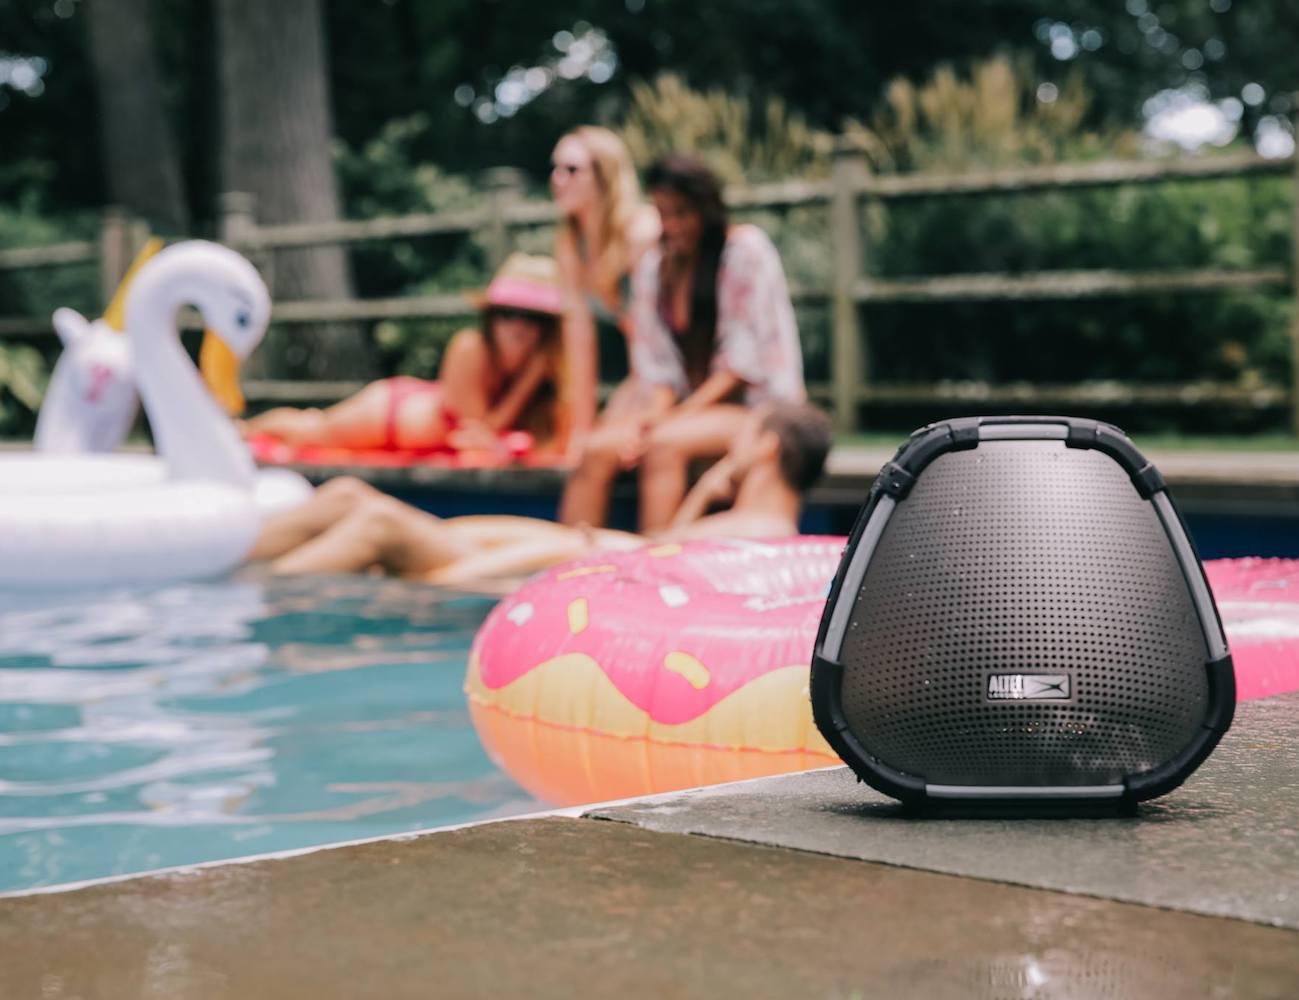 Altec Lansing VersA Smart Portable Bluetooth Speaker